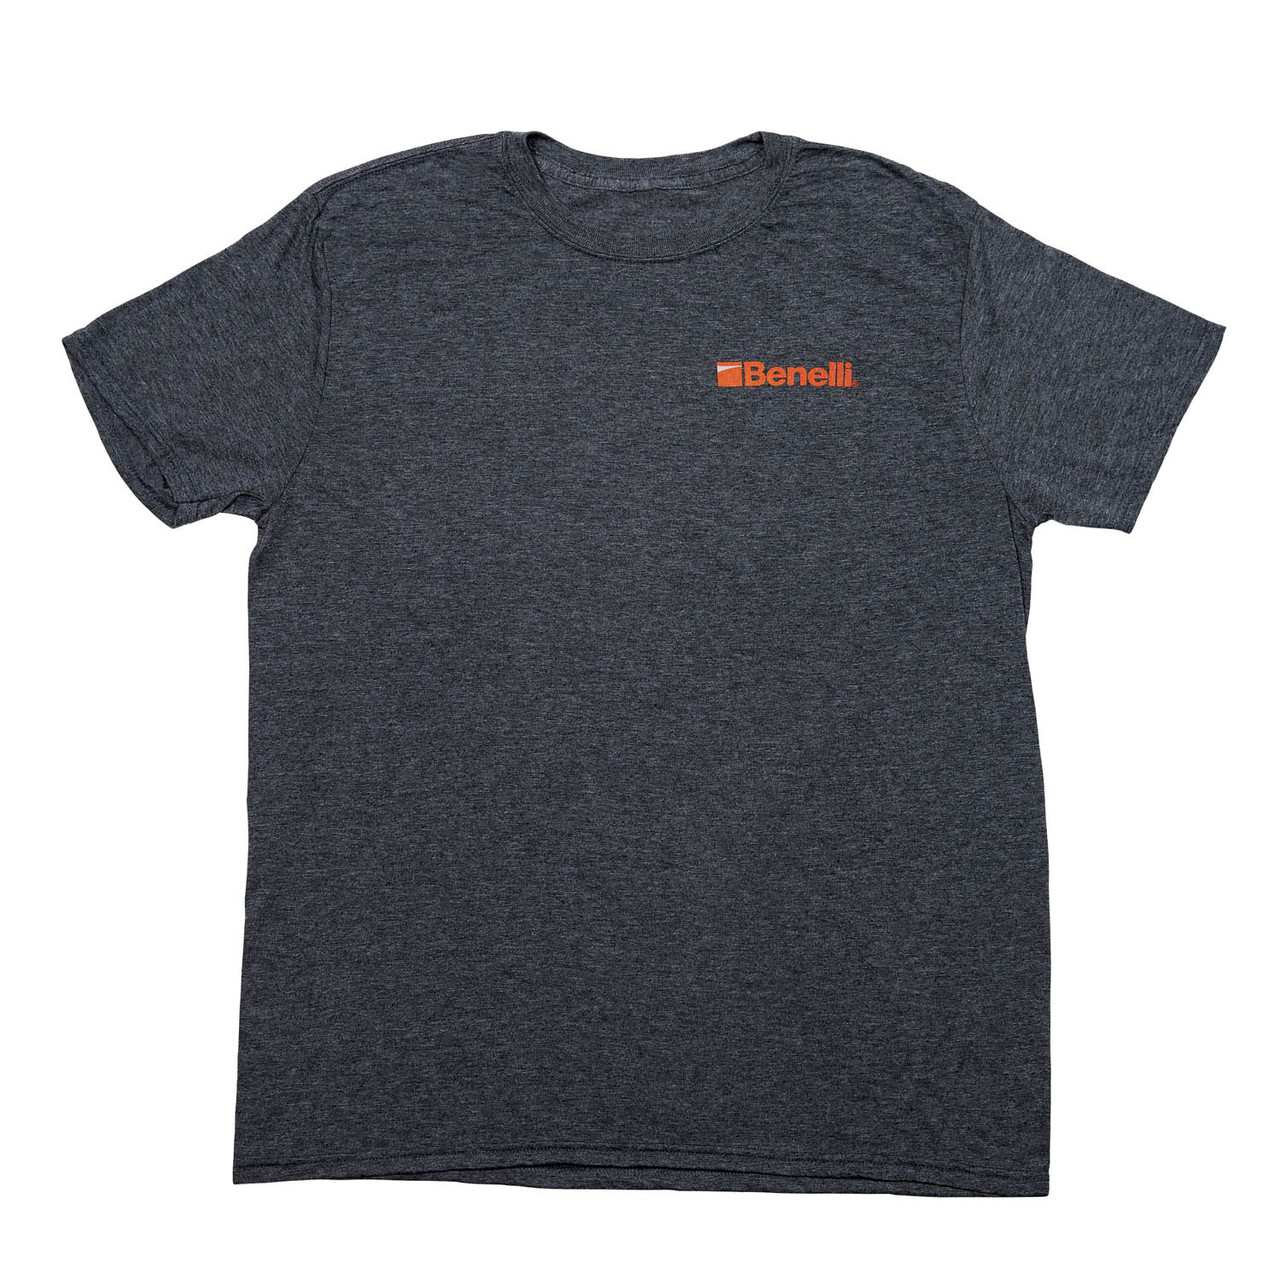 Benelli Dominate Short Sleeve T Shirt Dark Heather Medium